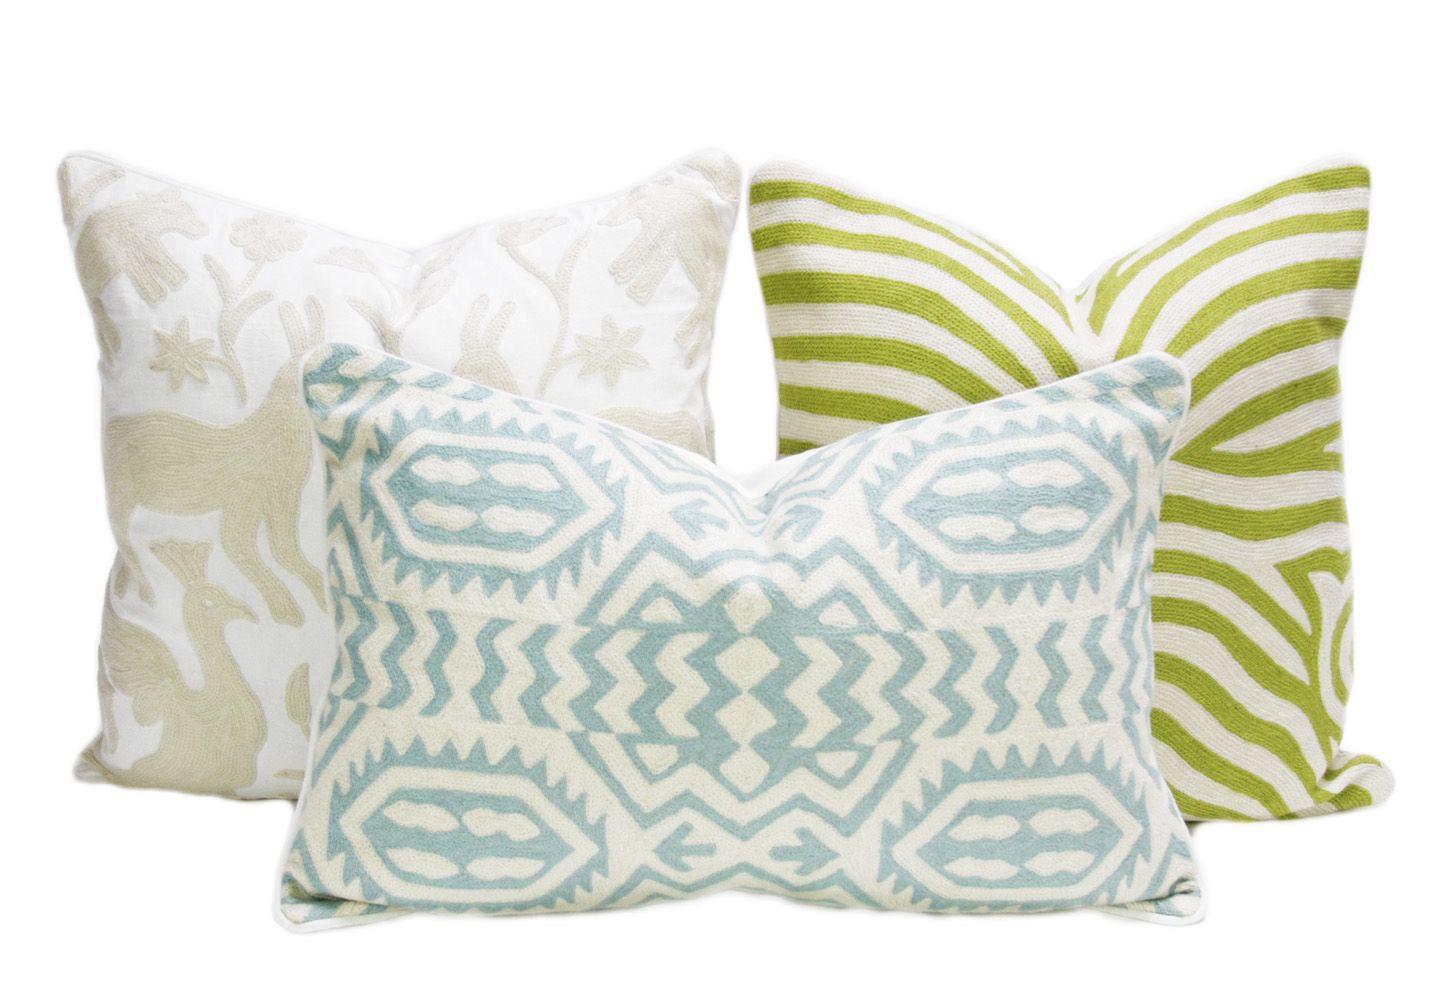 Marigold kashmiri native pillow